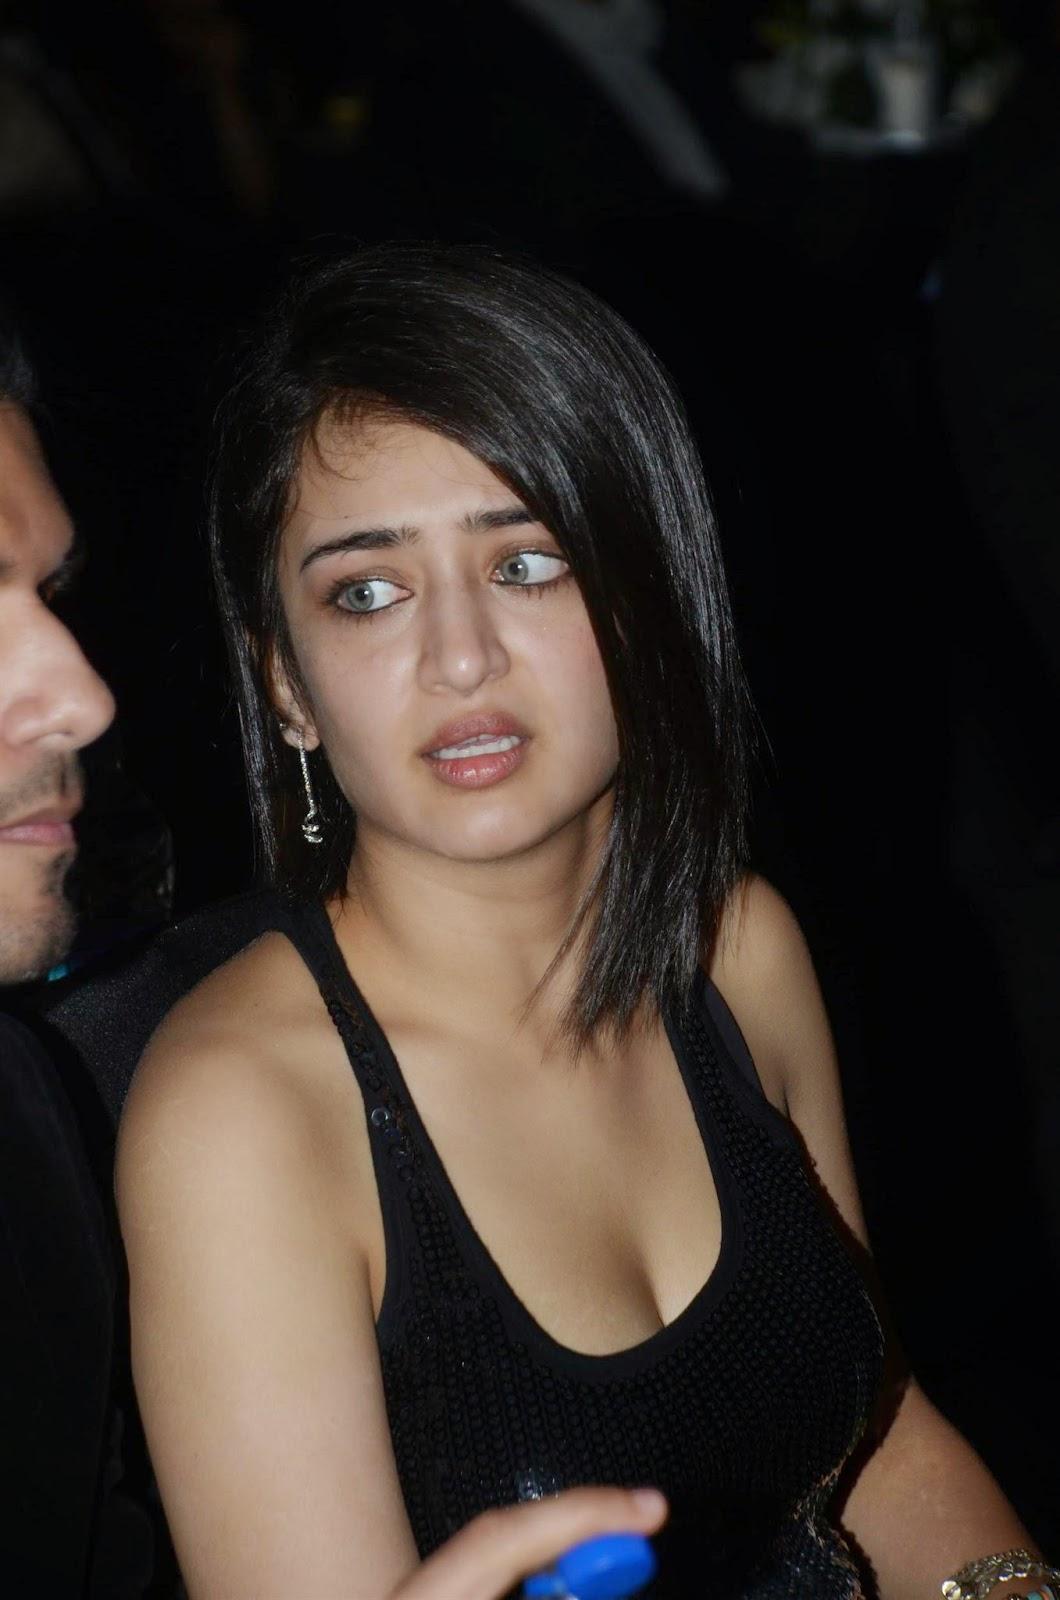 Cleavage Akshara Haasan nudes (31 photo), Hot